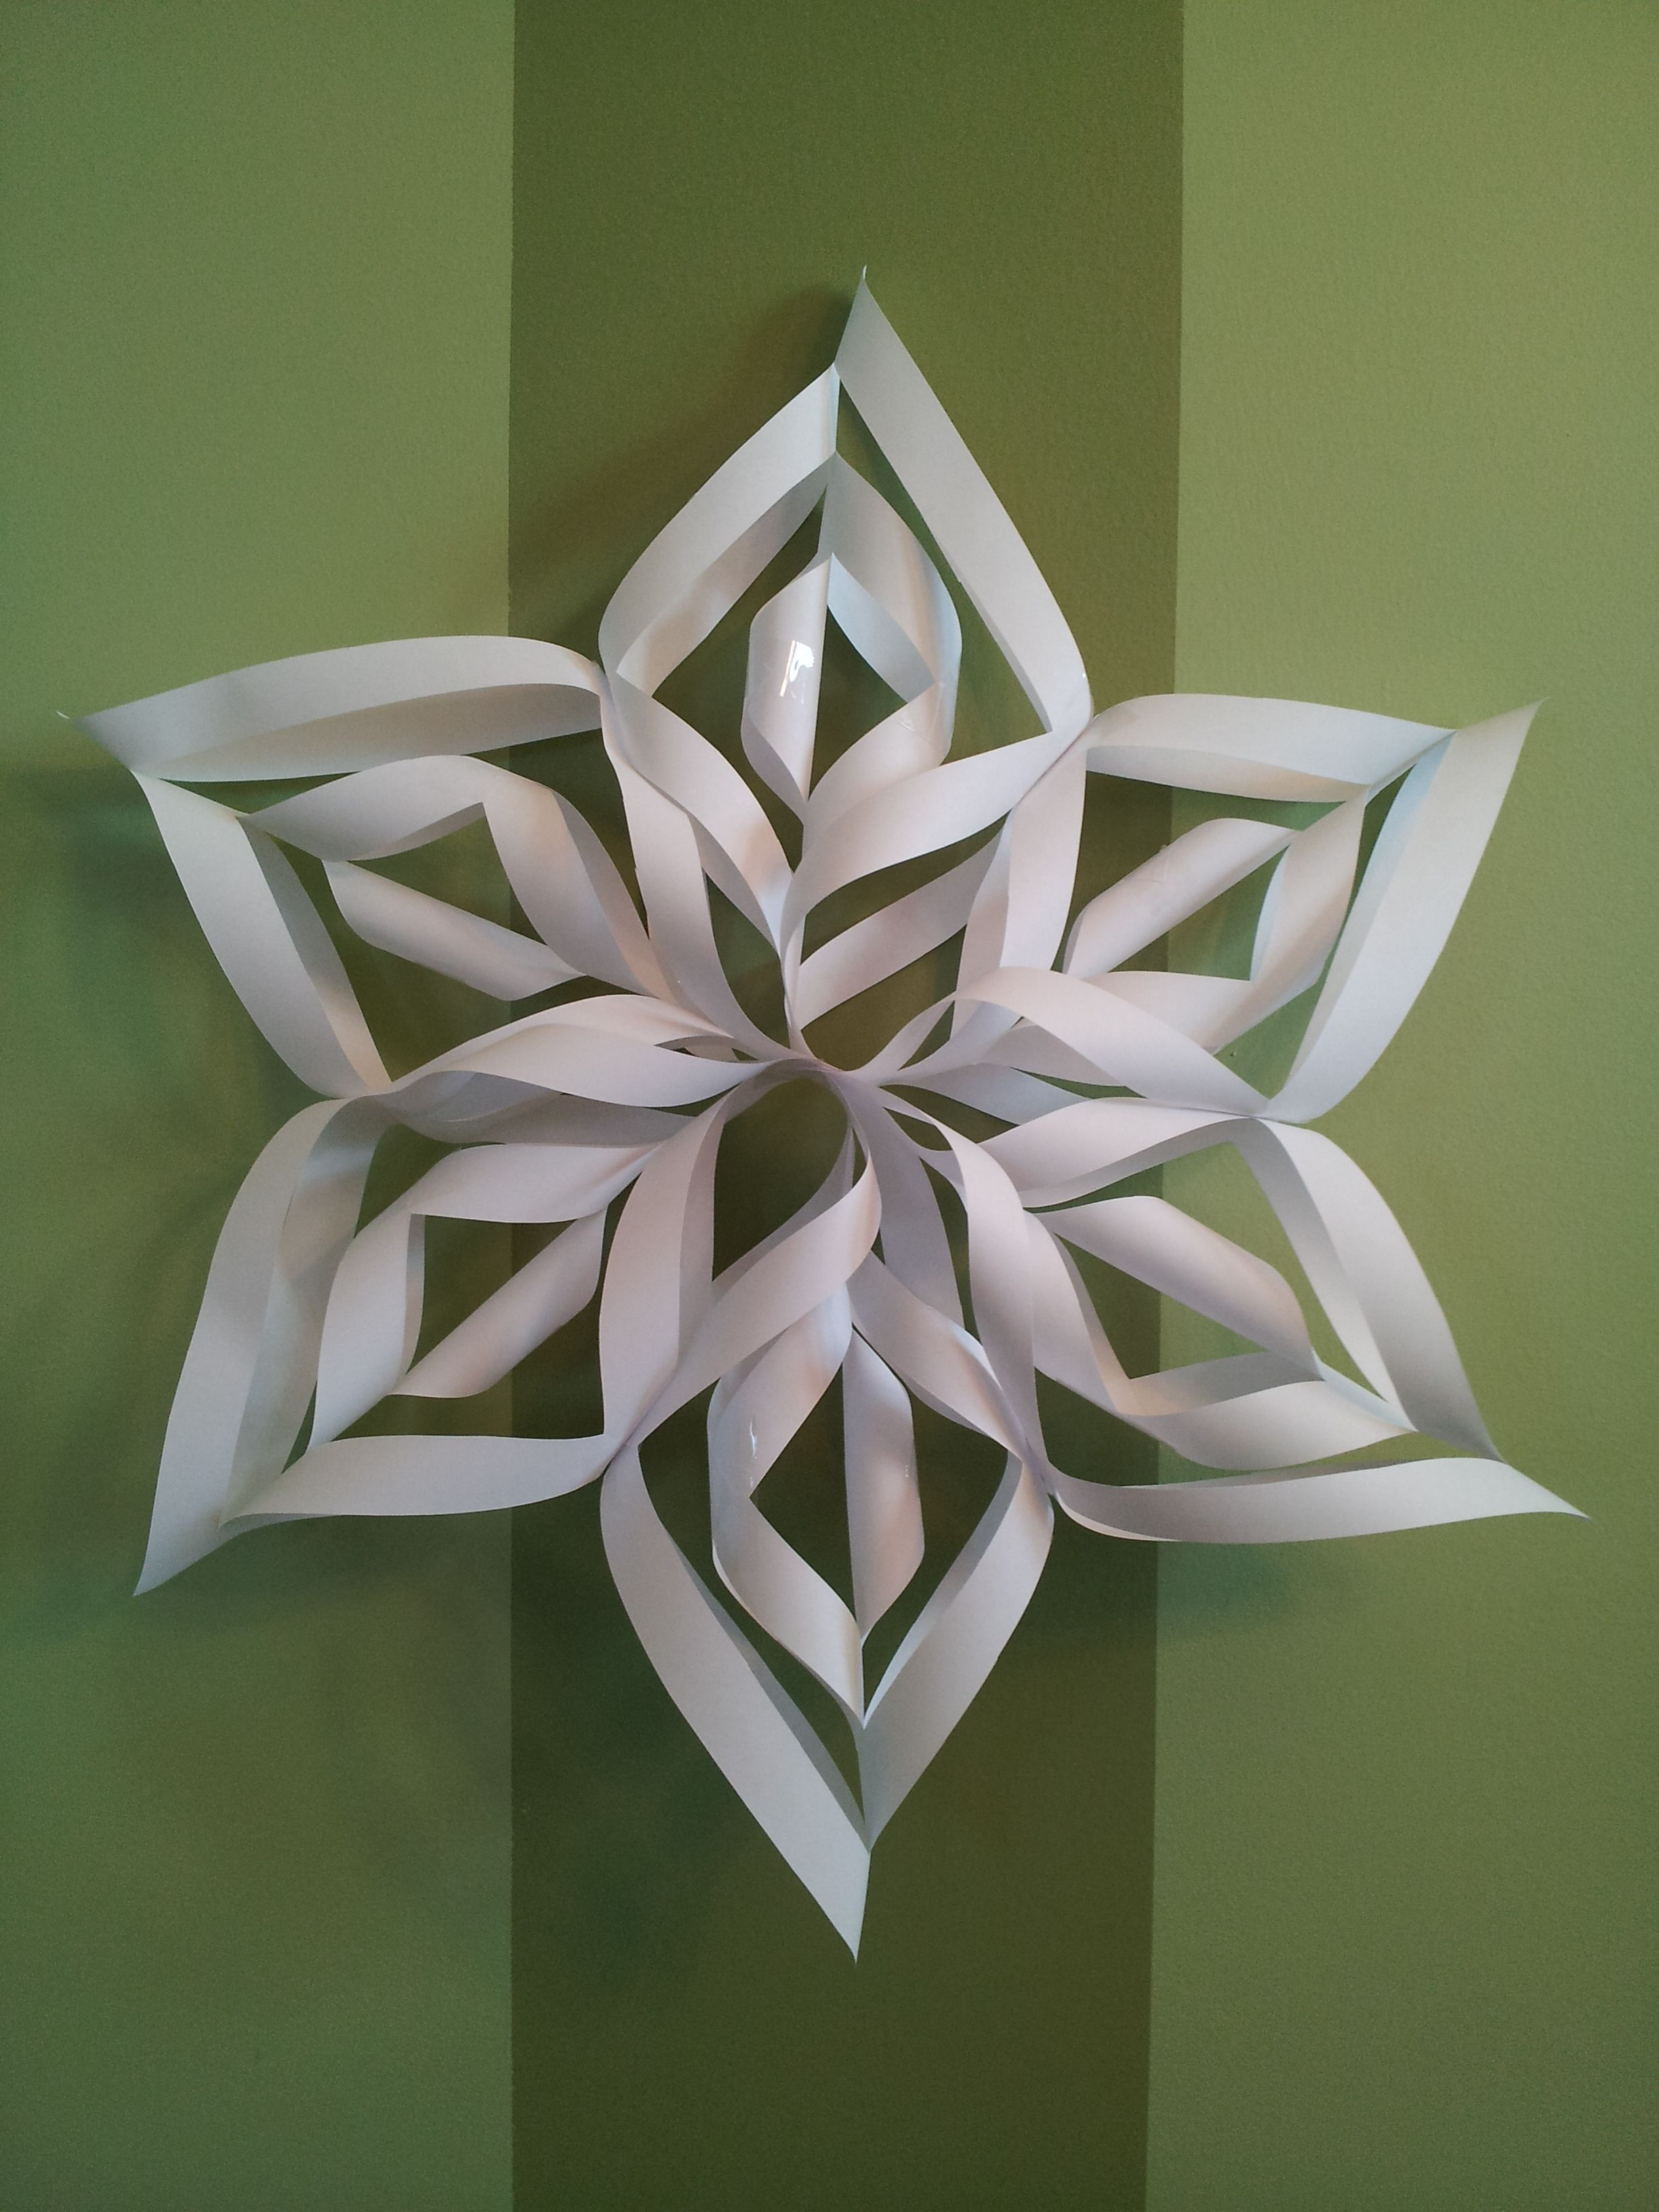 Snowflakes Crafts Pinterest